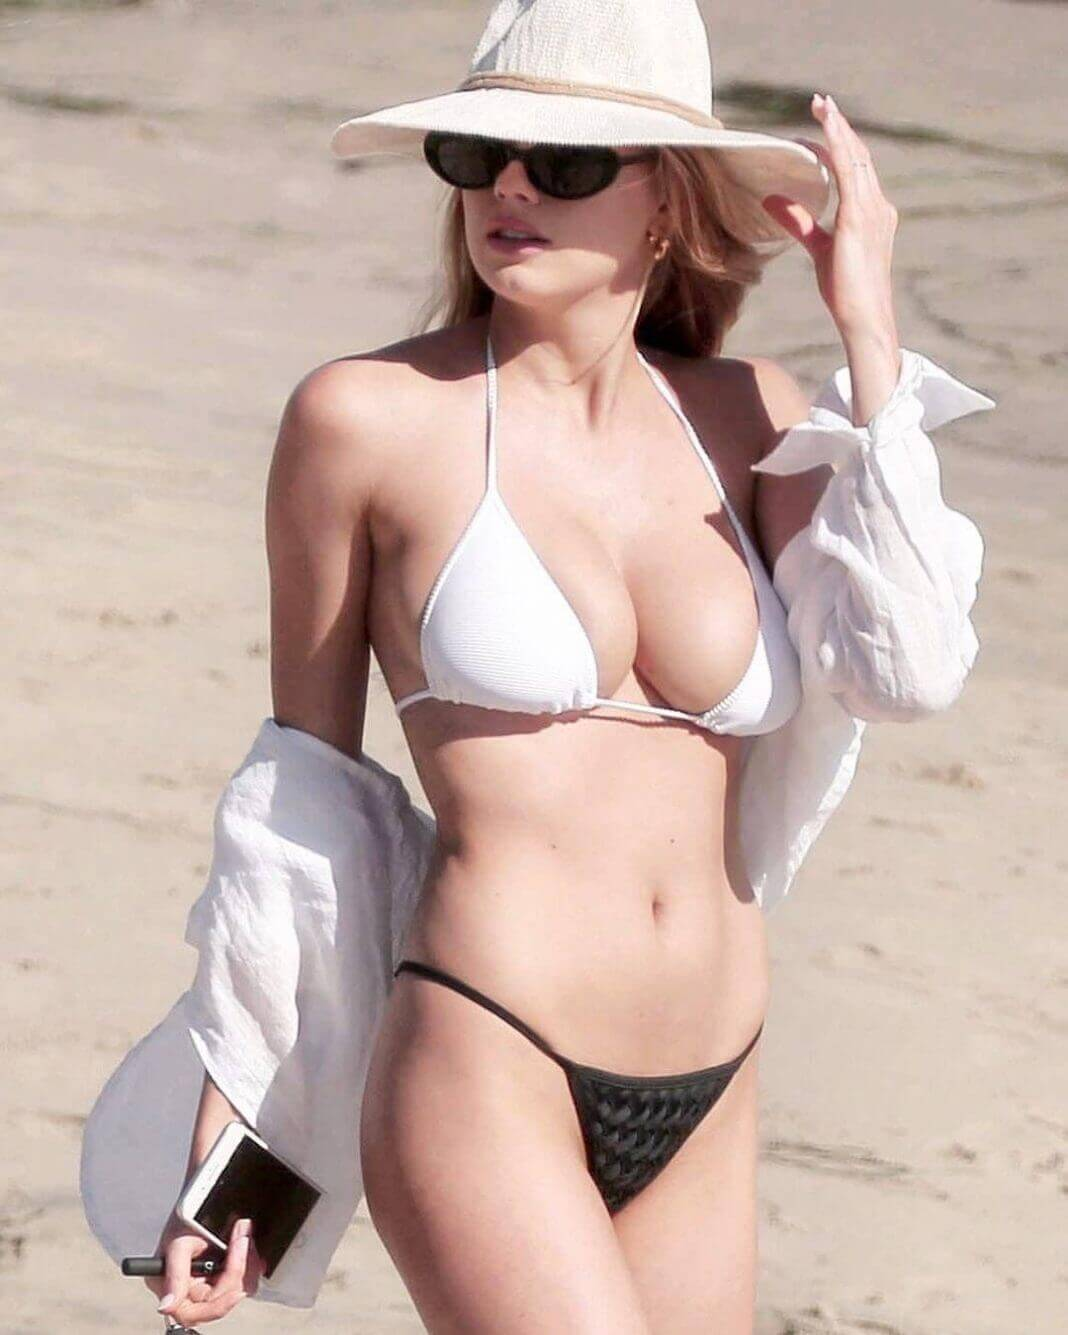 nude photos of amy adams